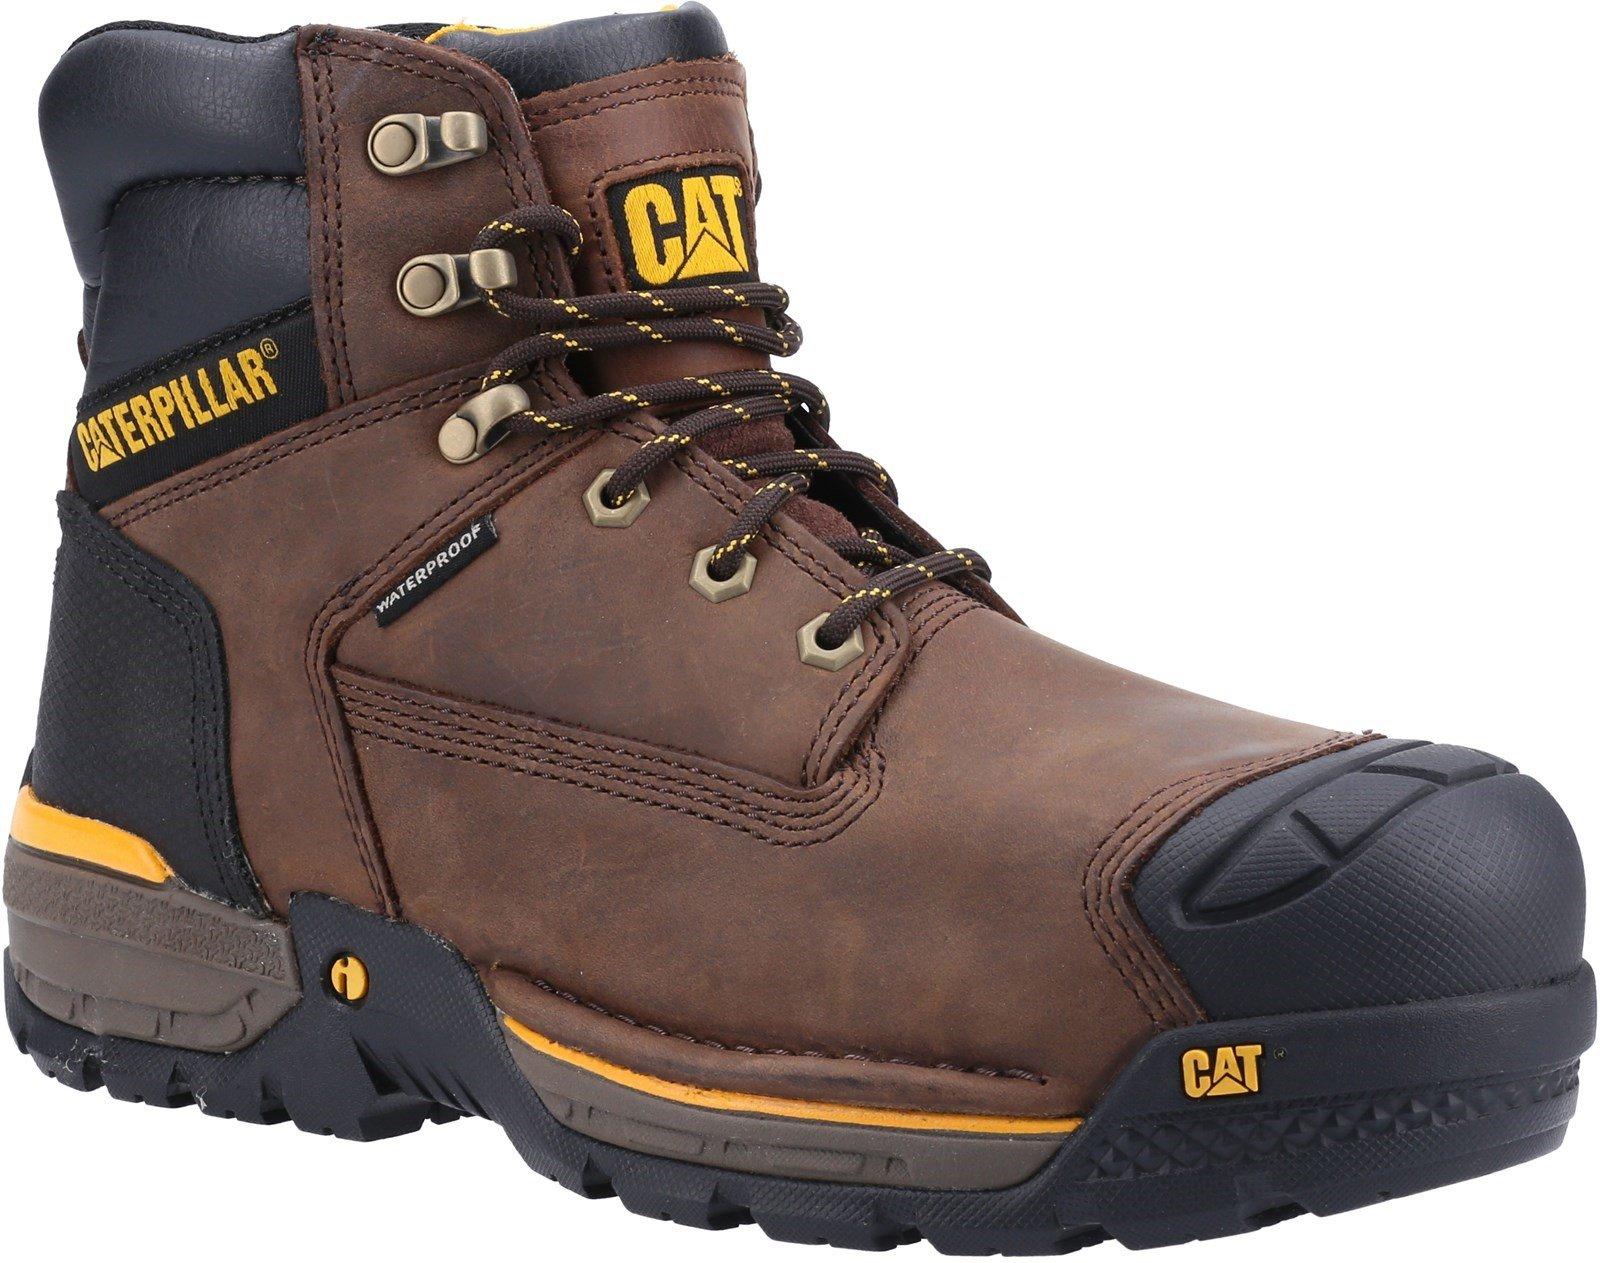 Caterpillar Unisex Excavator Lace Up Safety Hiker Boot Espresso - Espresso 6